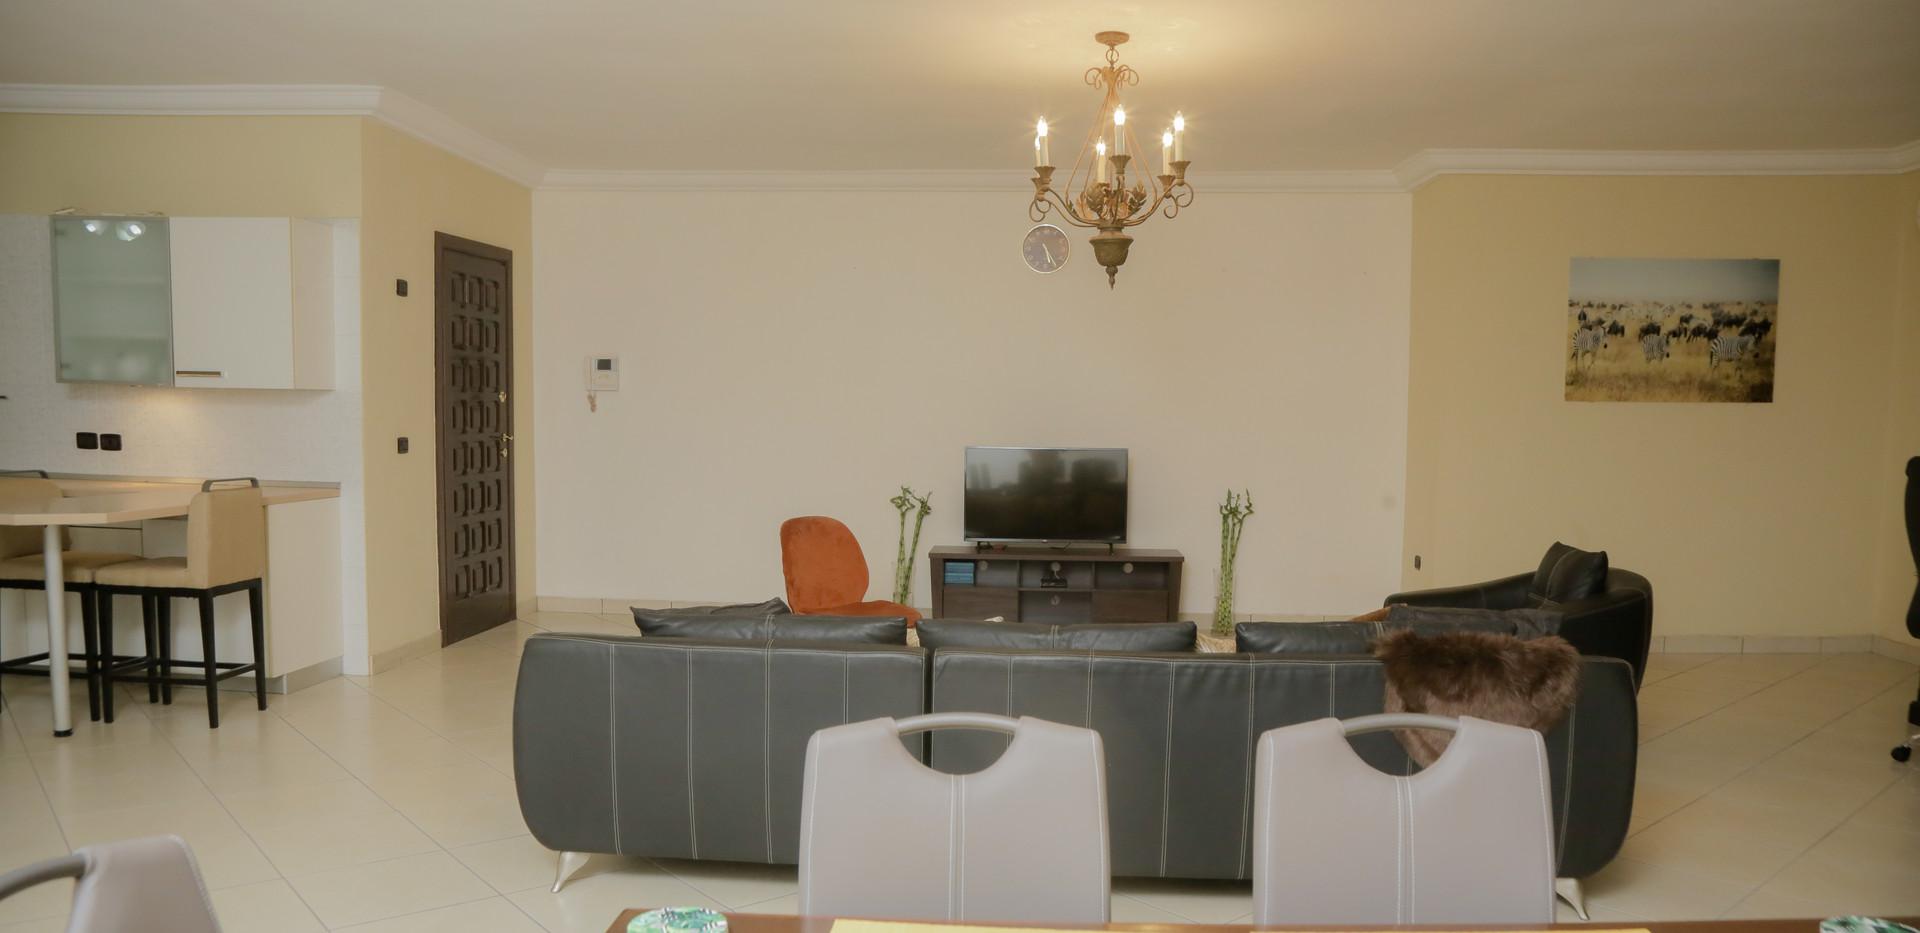 Apartments-28.JPG